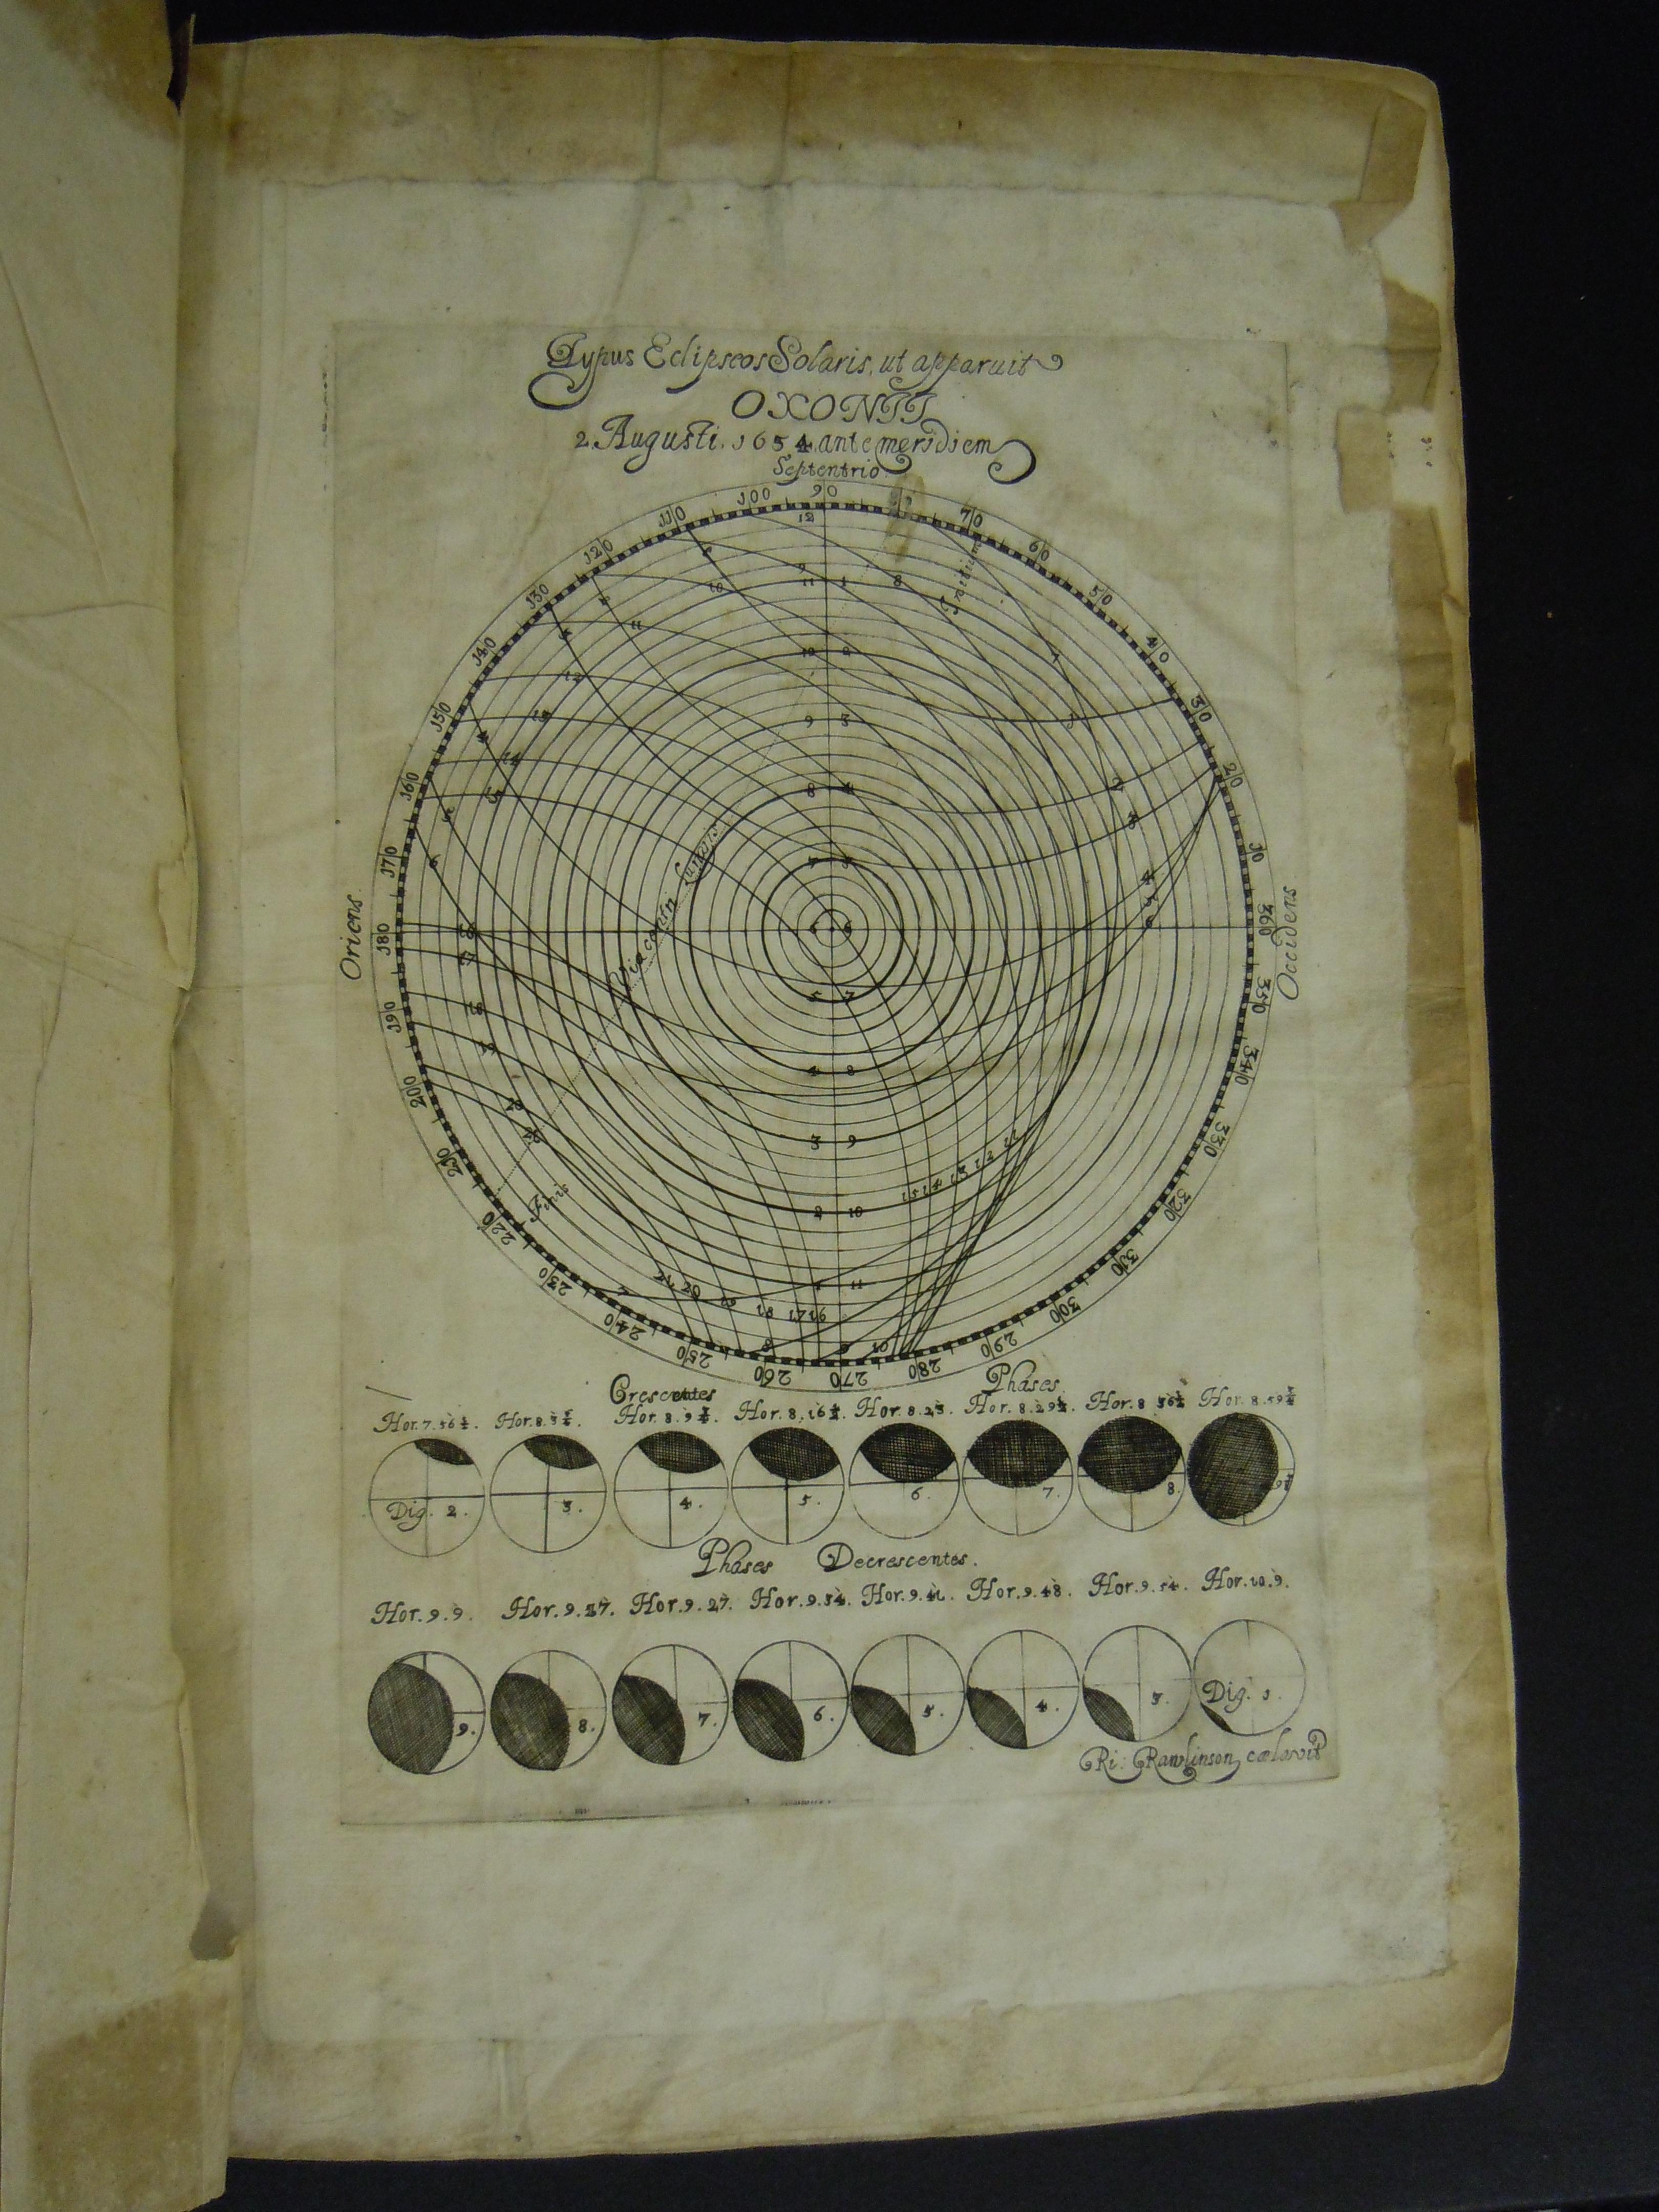 BT3.154.9, 1st flyleaf, Giovanni Battista Riccioli's Almagestum novum, 1653